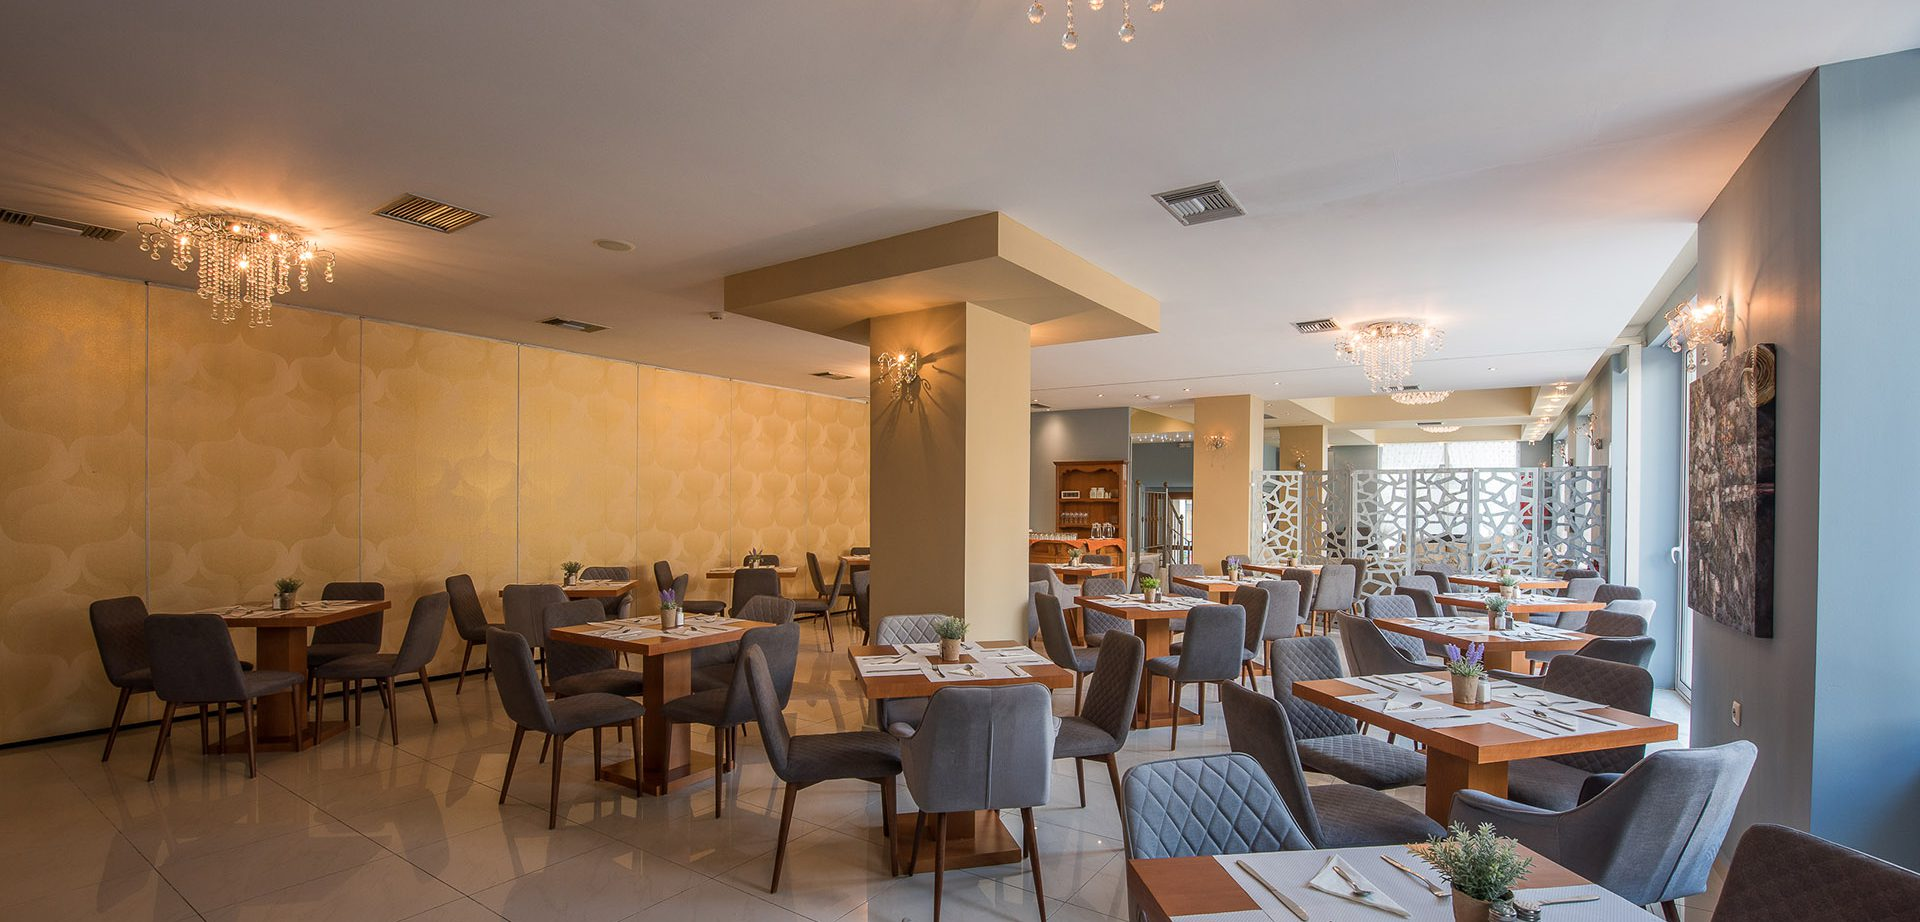 hotelrestaurant3